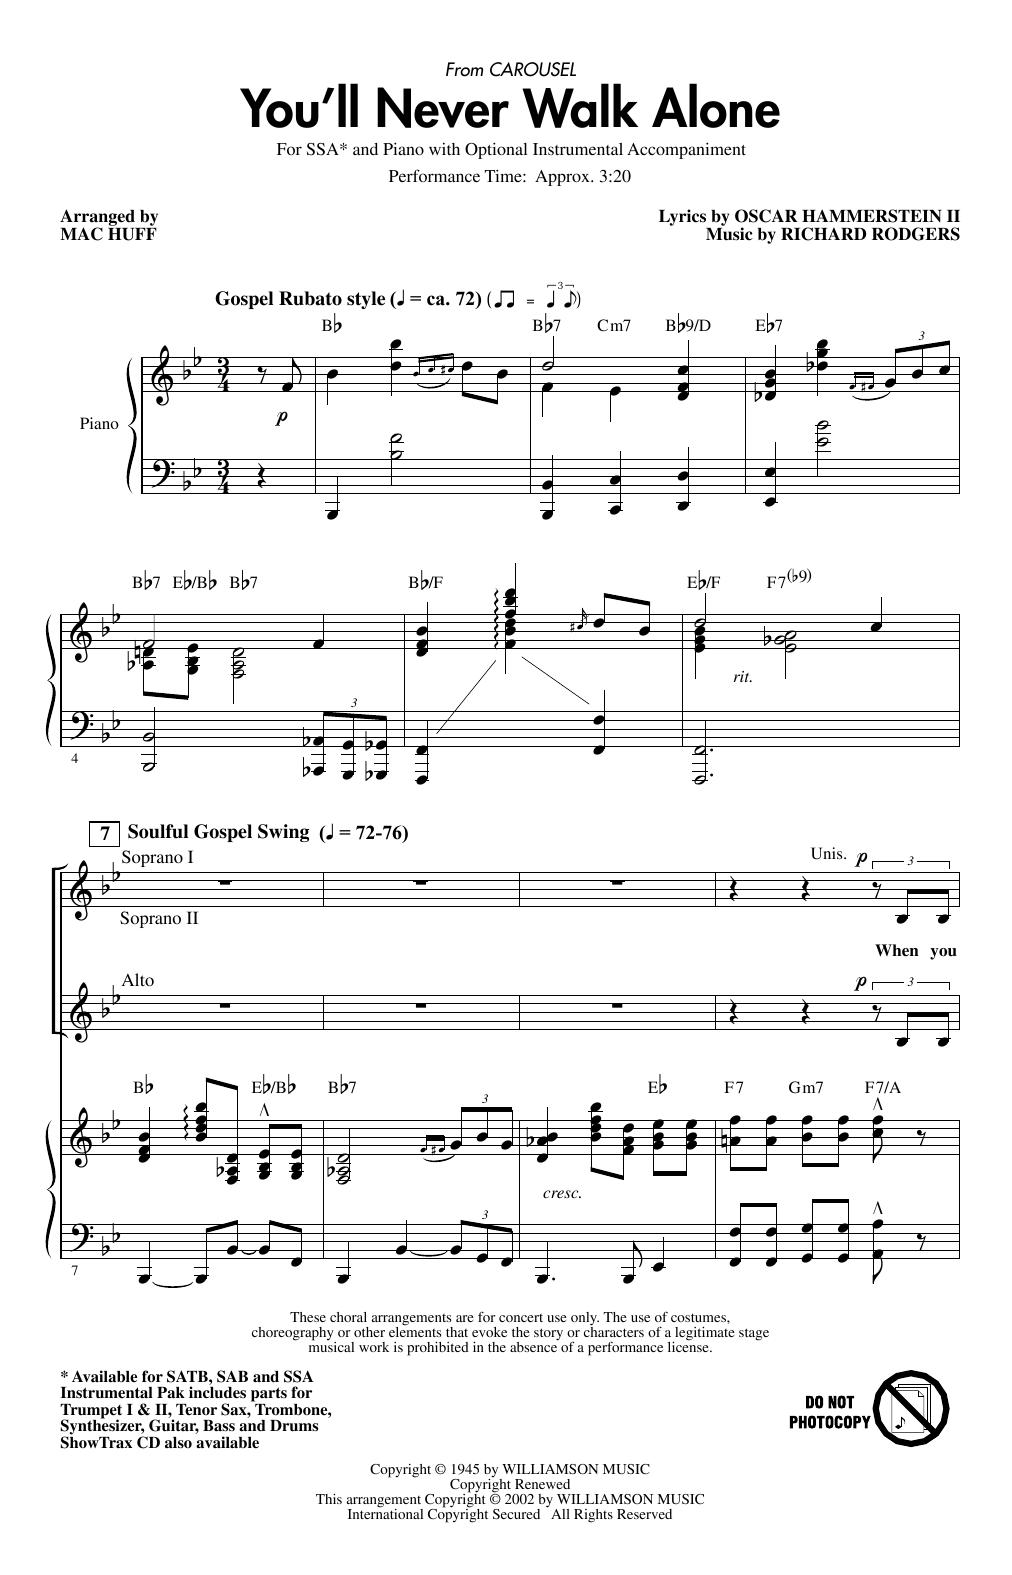 You'll Never Walk Alone (from Carousel) (arr. Mac Huff) Sheet Music